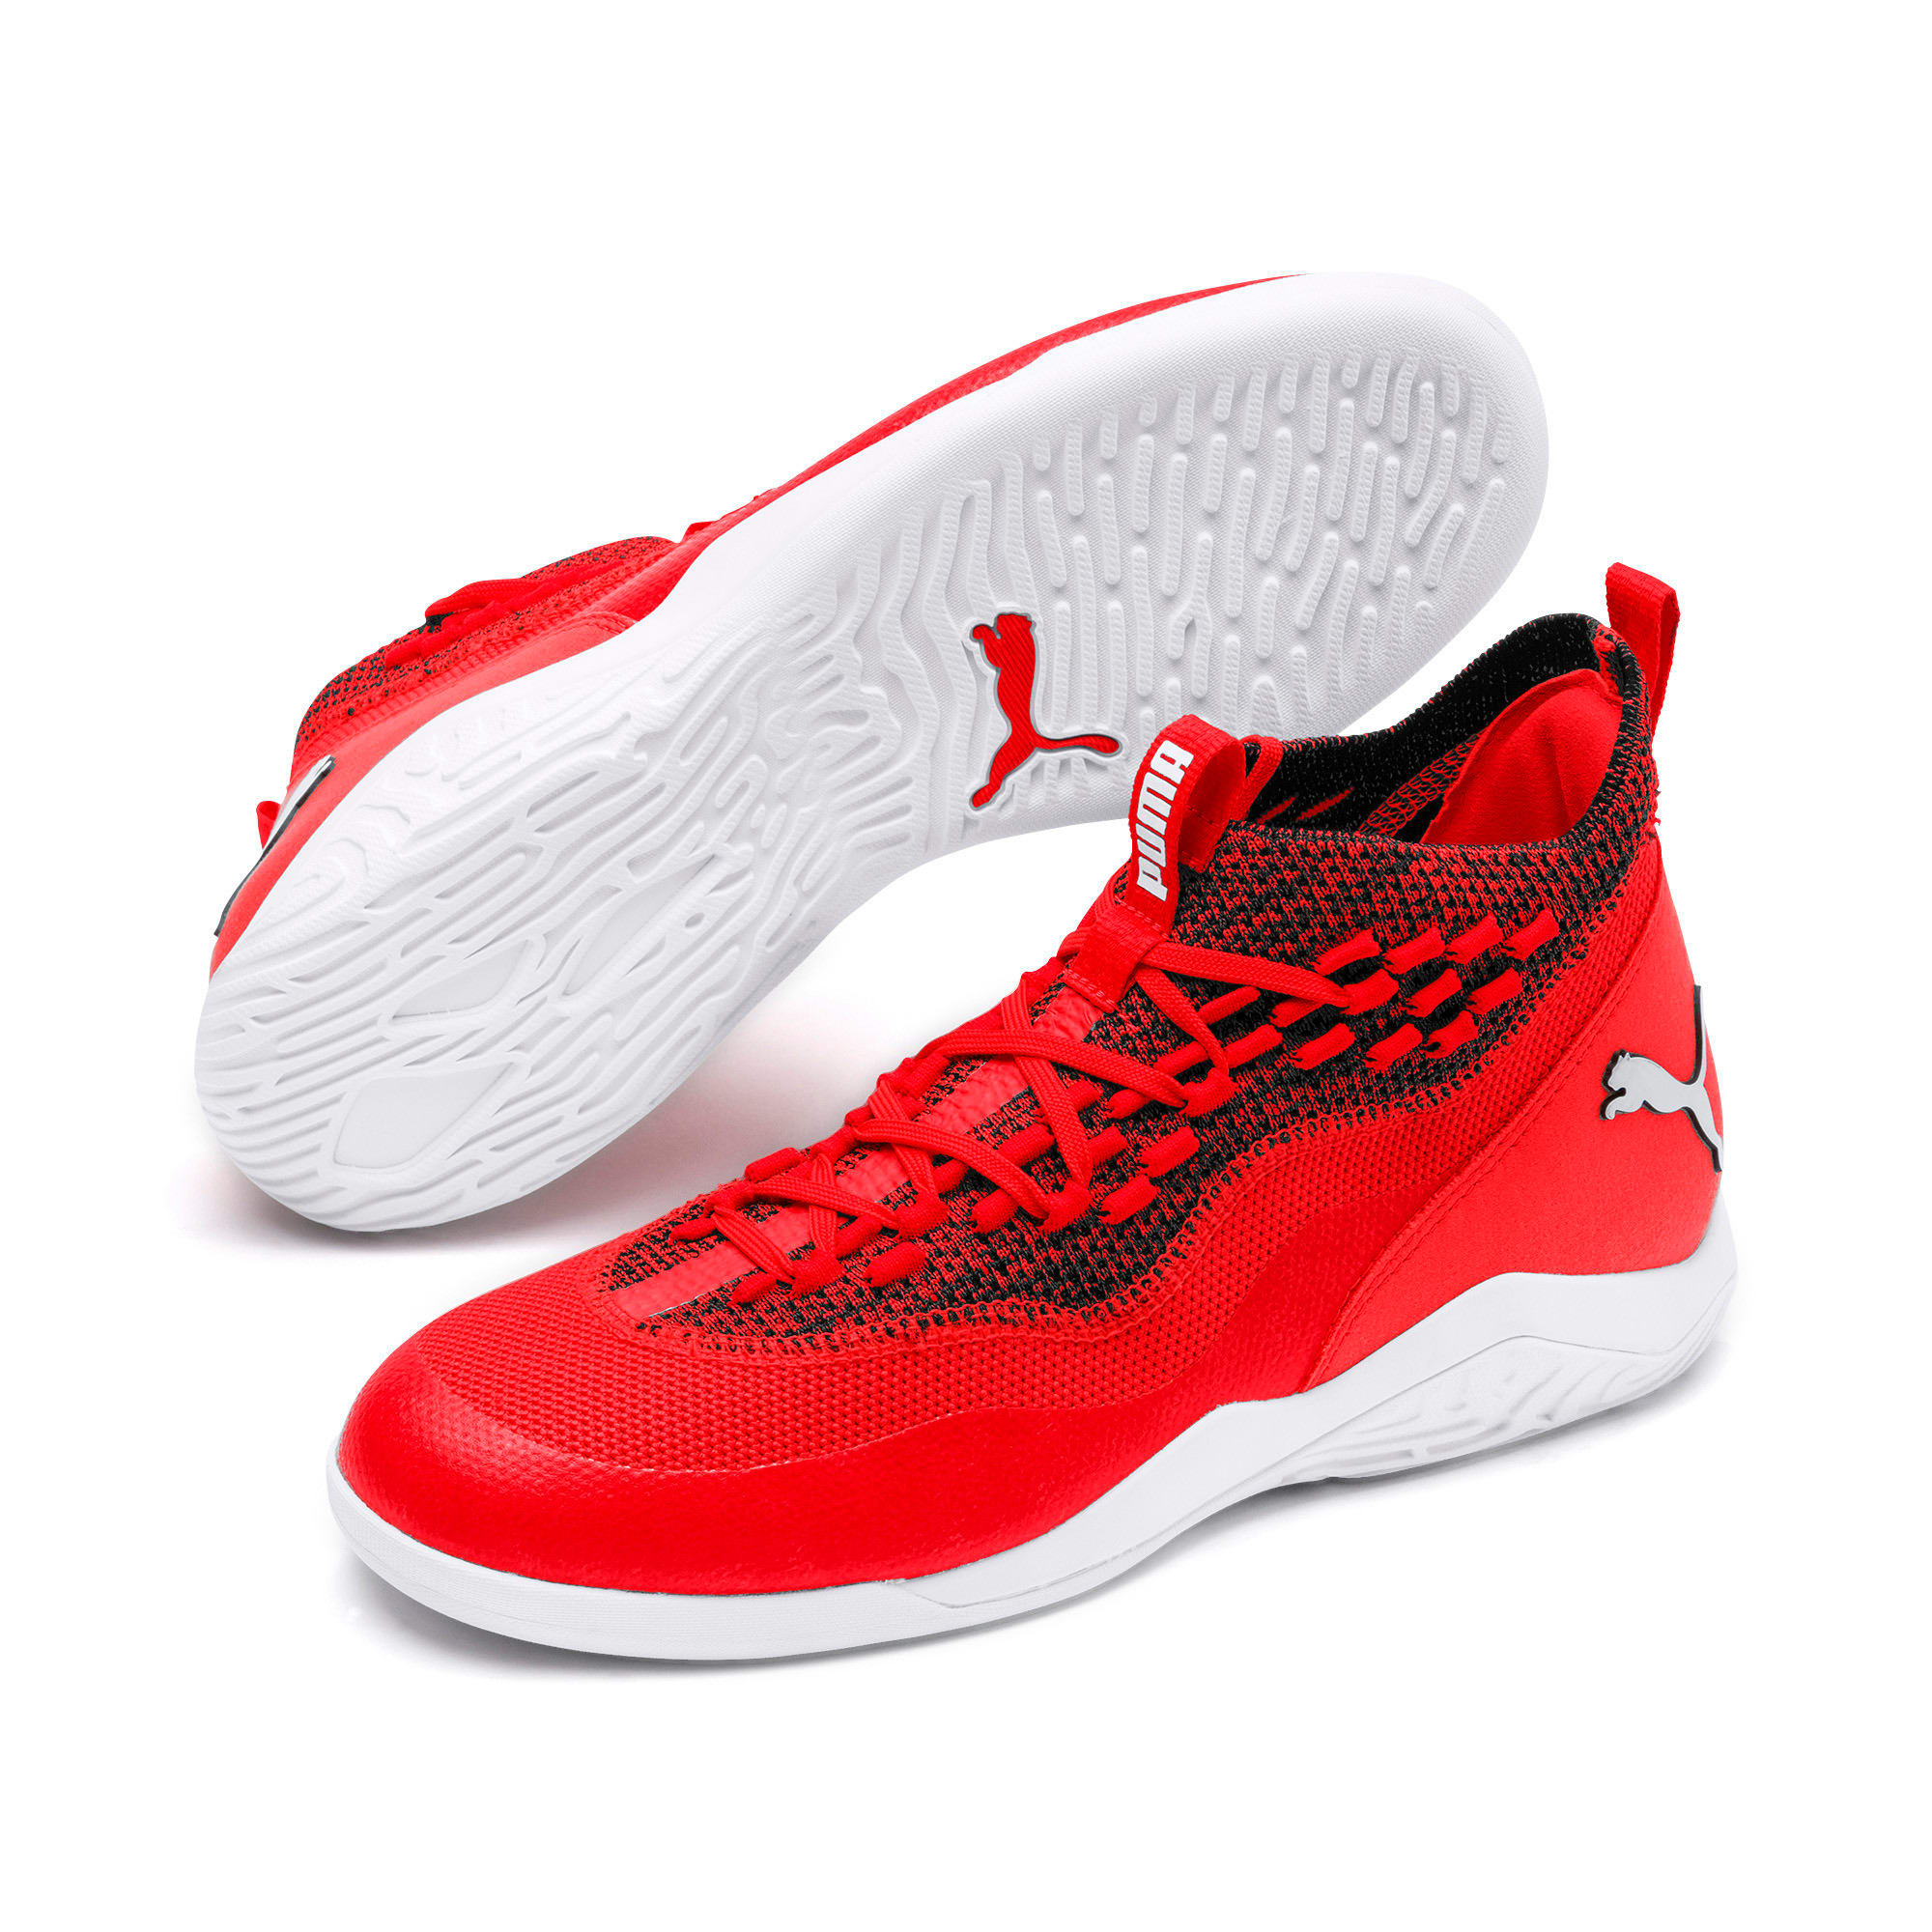 Thumbnail 2 of 365 IGNITE Fuse P 1 Men's Soccer Shoes, Red Blast-White-Puma Black, medium